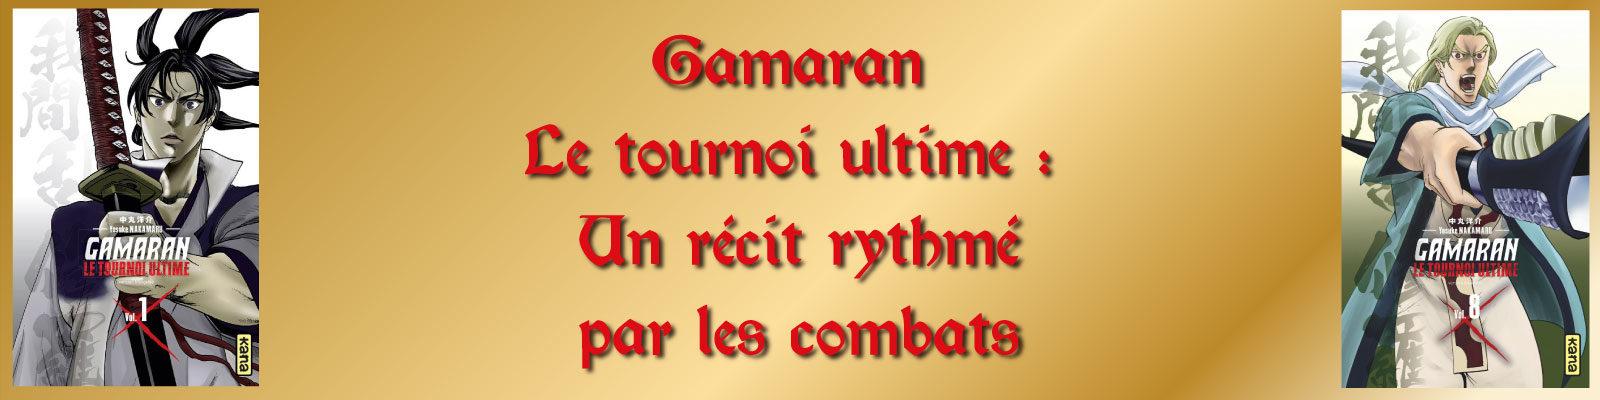 Gamaran---Le-Tournoi-ultime-Vol.-8-1